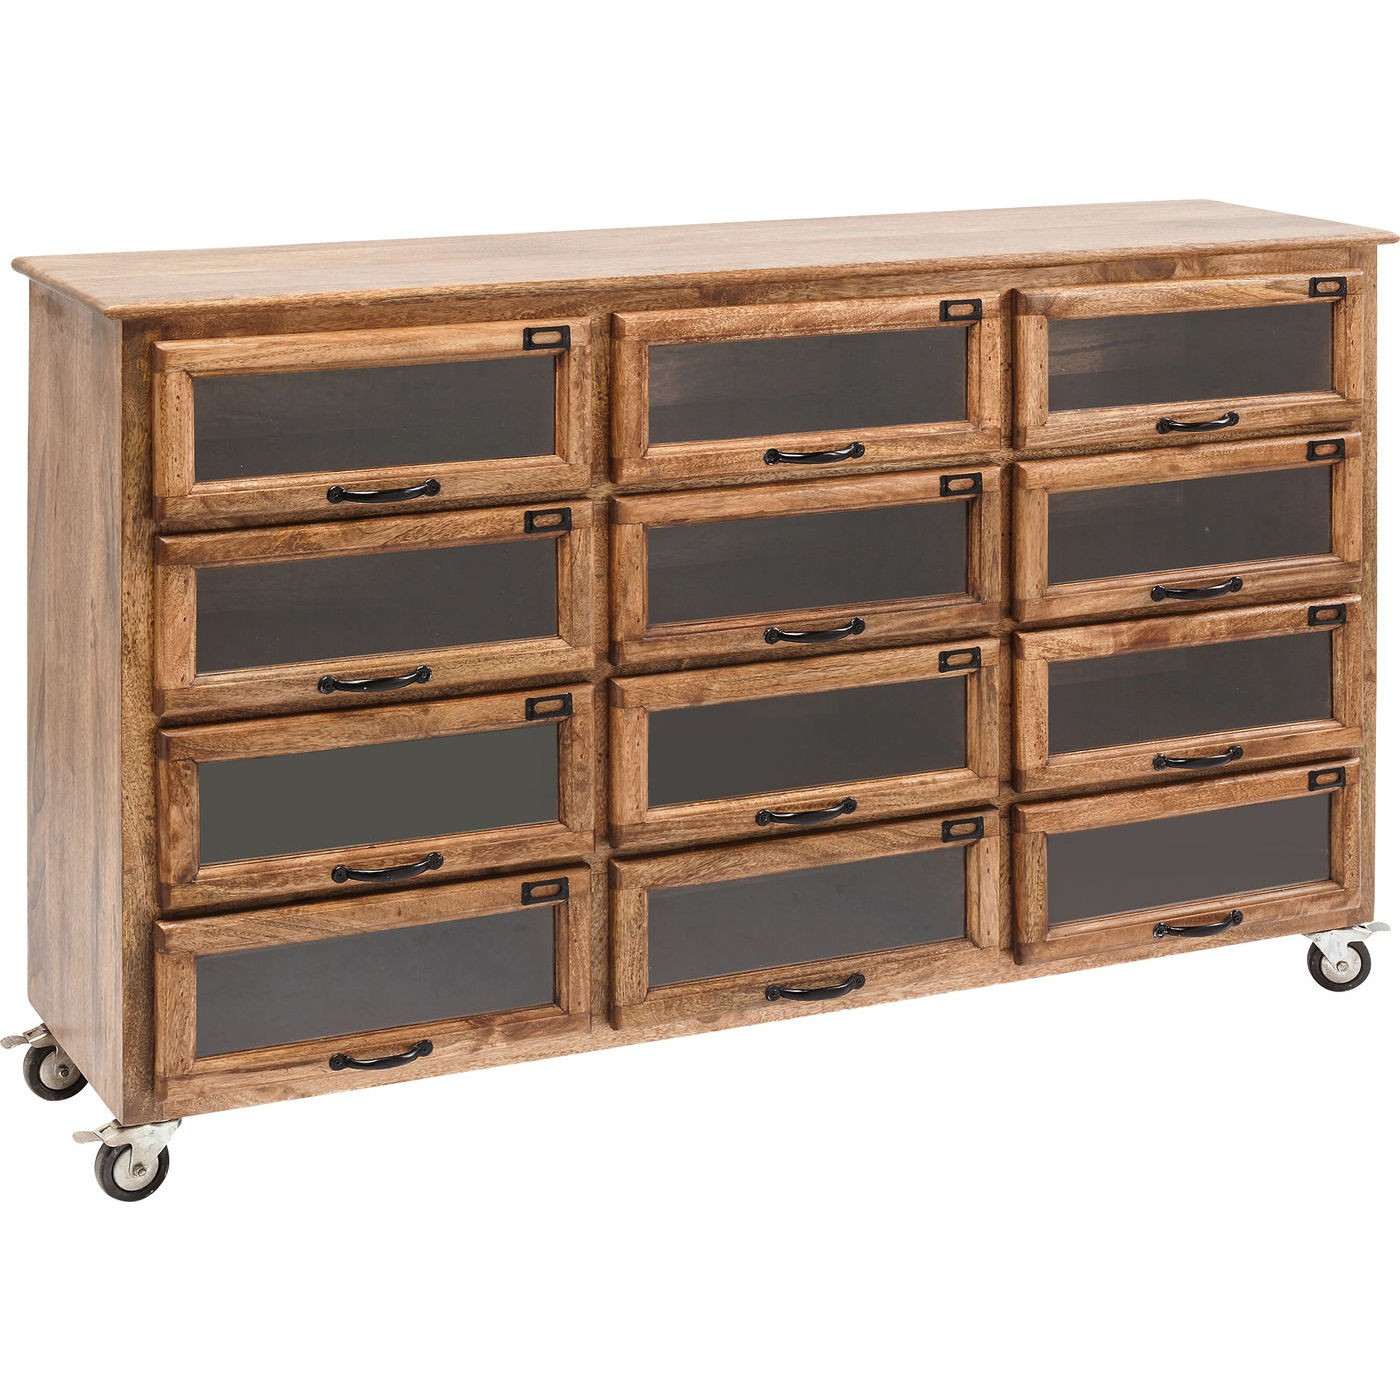 kare design drugstore kommode mangotr og glas m hjul og 12 skuffer 150x41 kommoder bobo. Black Bedroom Furniture Sets. Home Design Ideas